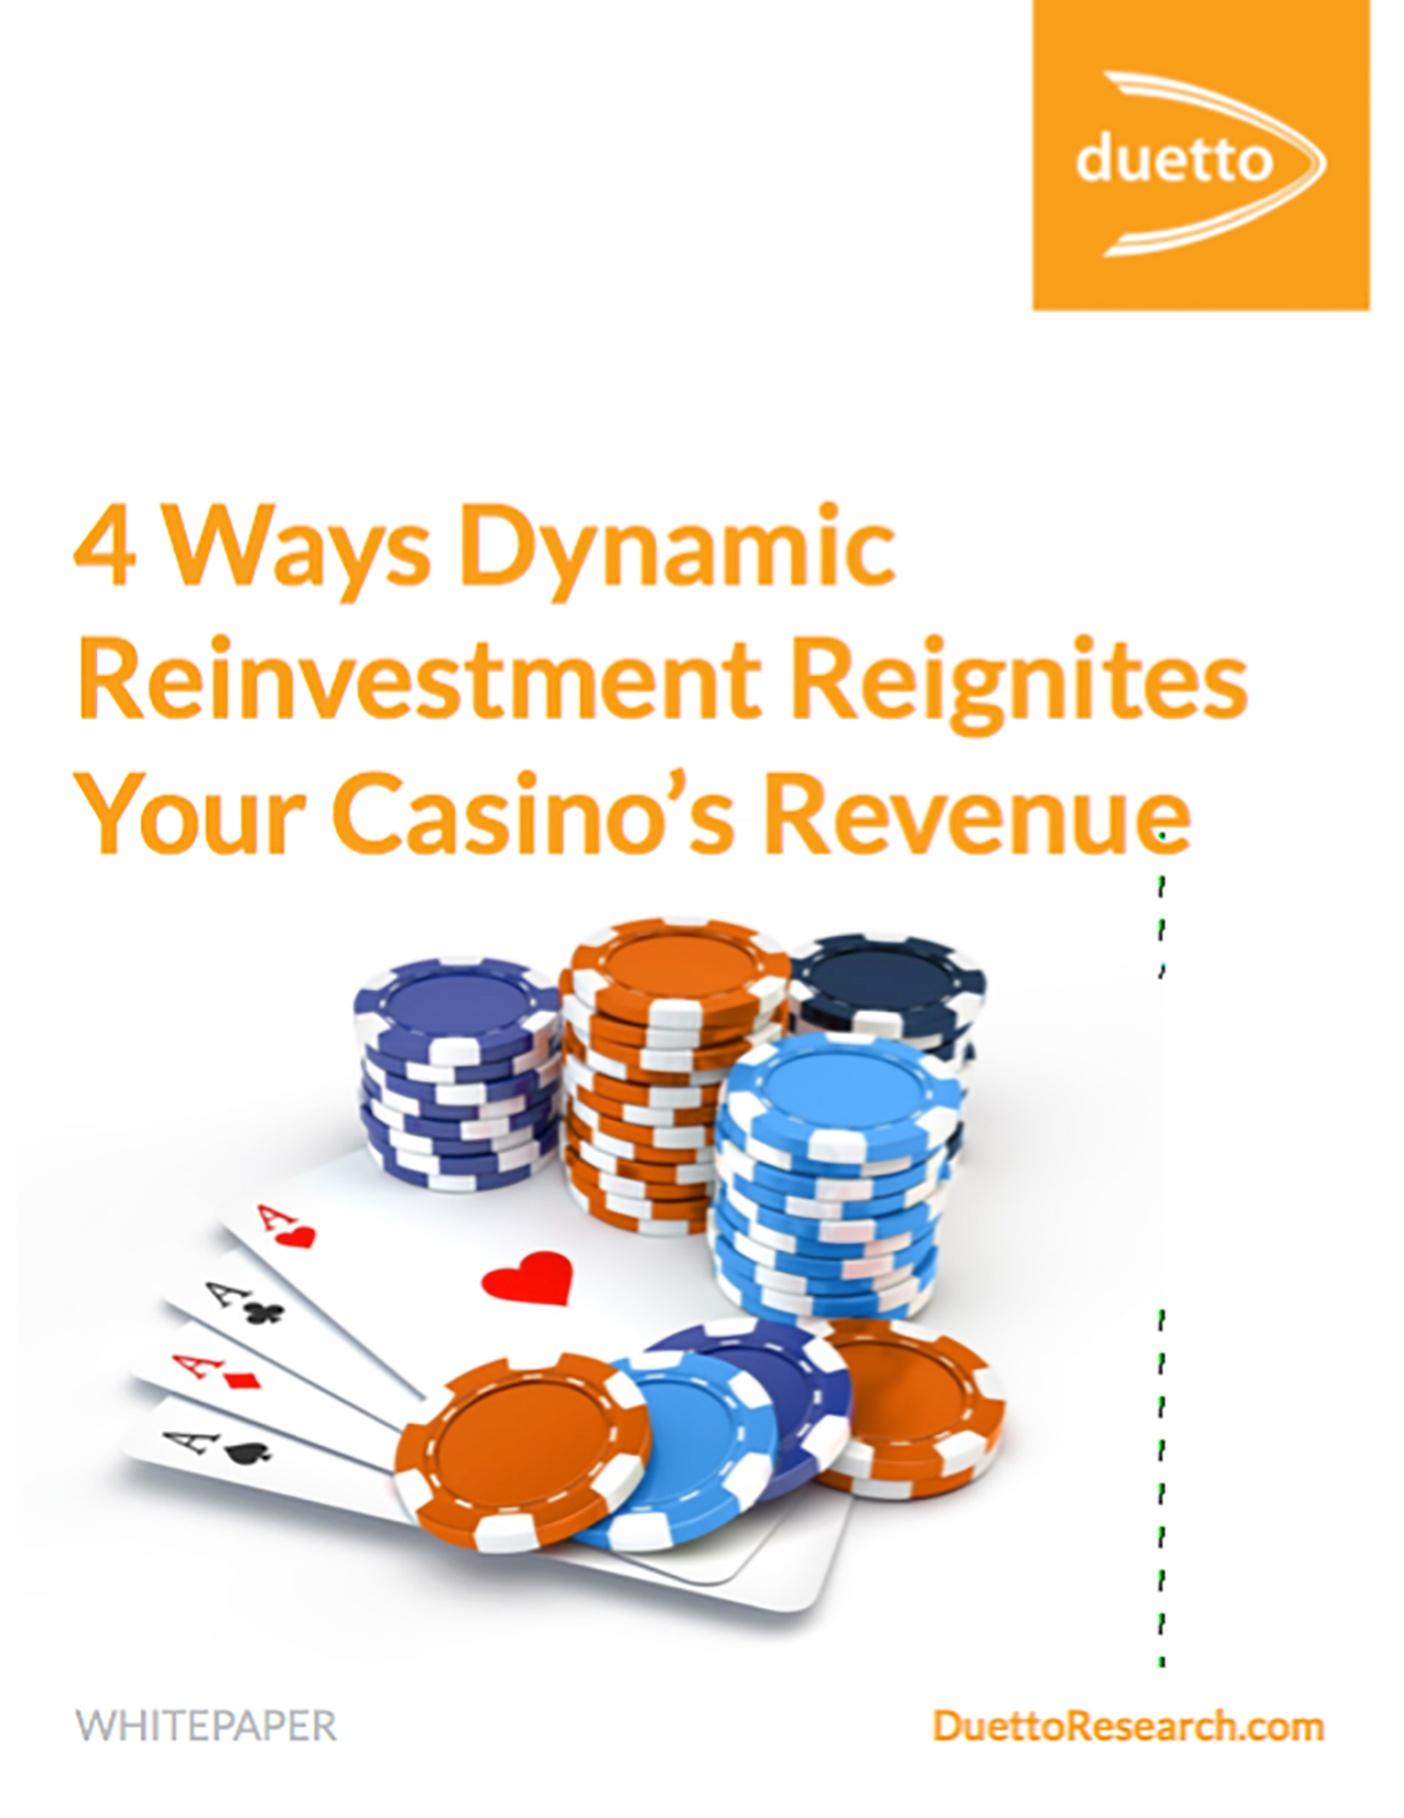 WP 4 Ways Dynamic Reinvestment 1.jpg